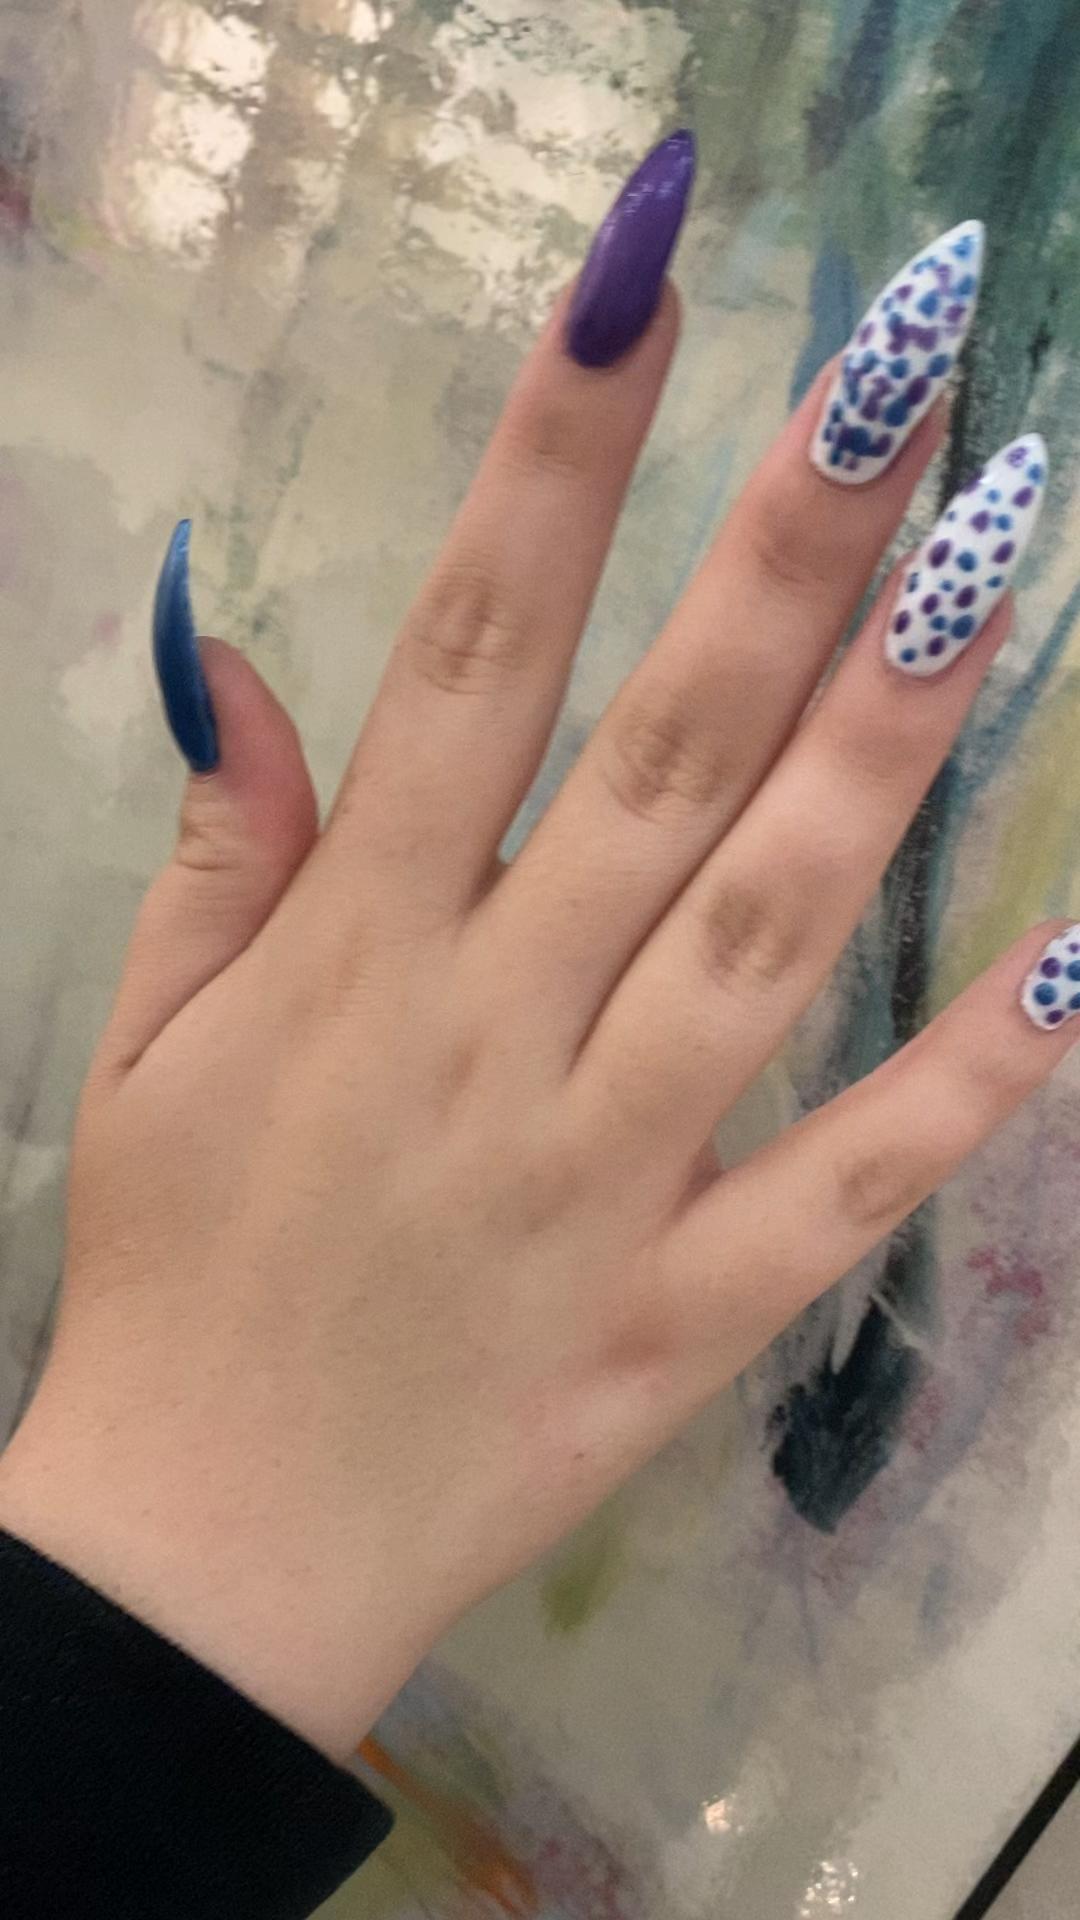 #colourful #nailsofinstagram #stilettonails #edmontonnails #edmonton